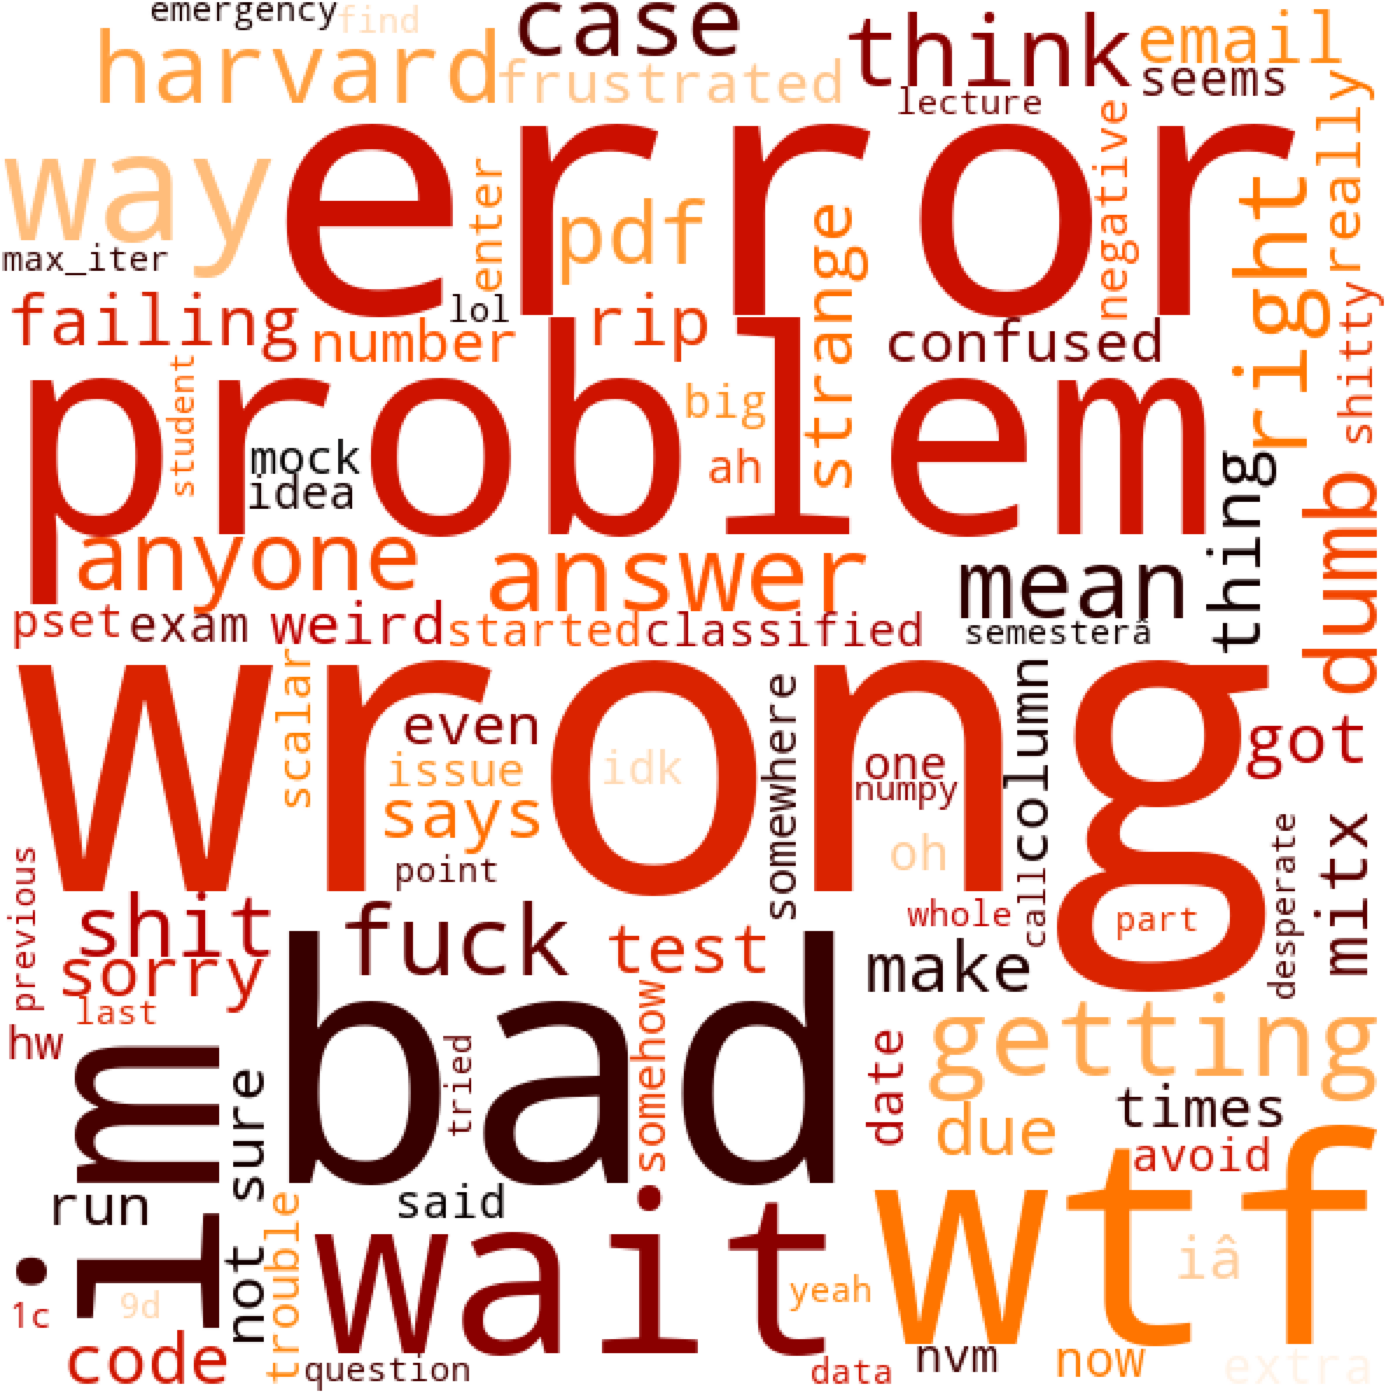 6.036 negative message word cloud